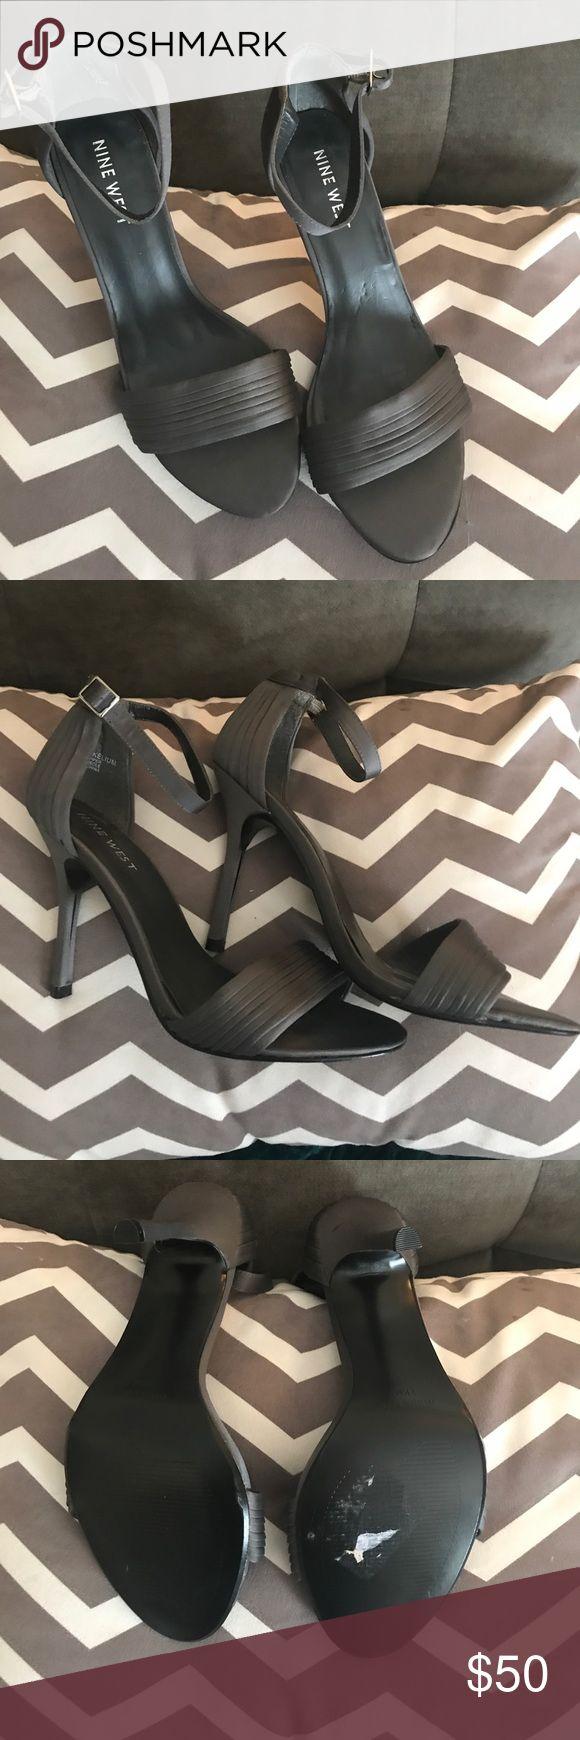 Nine West Heels Size 7 1/2 gray Nine West Heels. Practically brand new. Worn once to a wedding. Nine West Shoes Heels